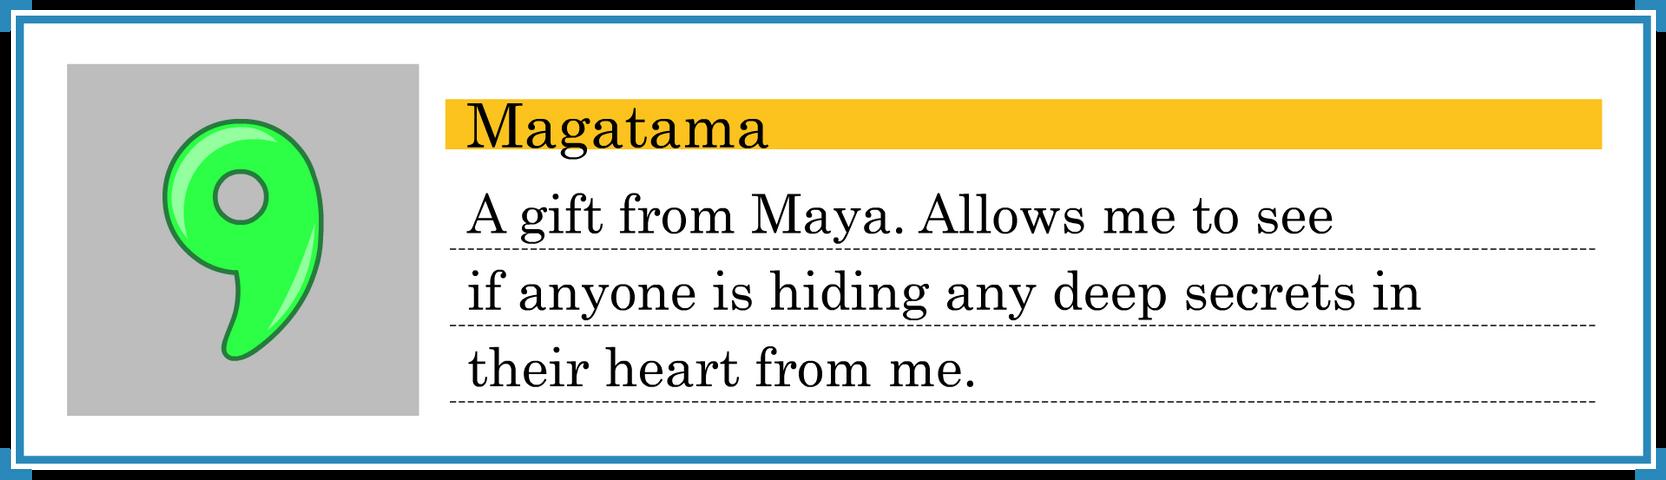 Magatama Evidence [Shaded]